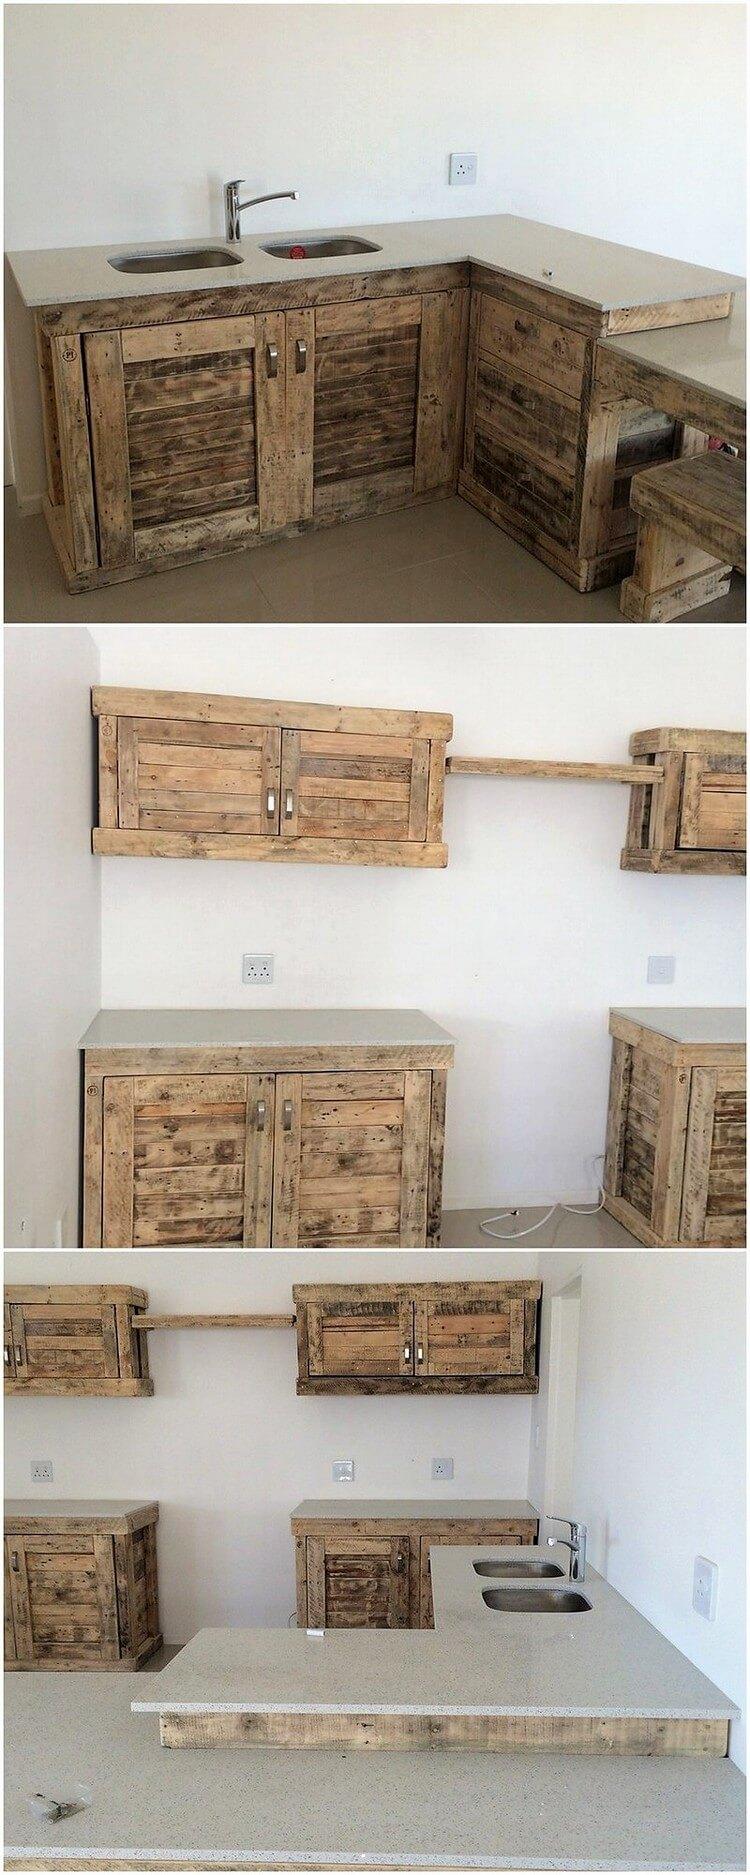 Downside Kitchen Cabinets